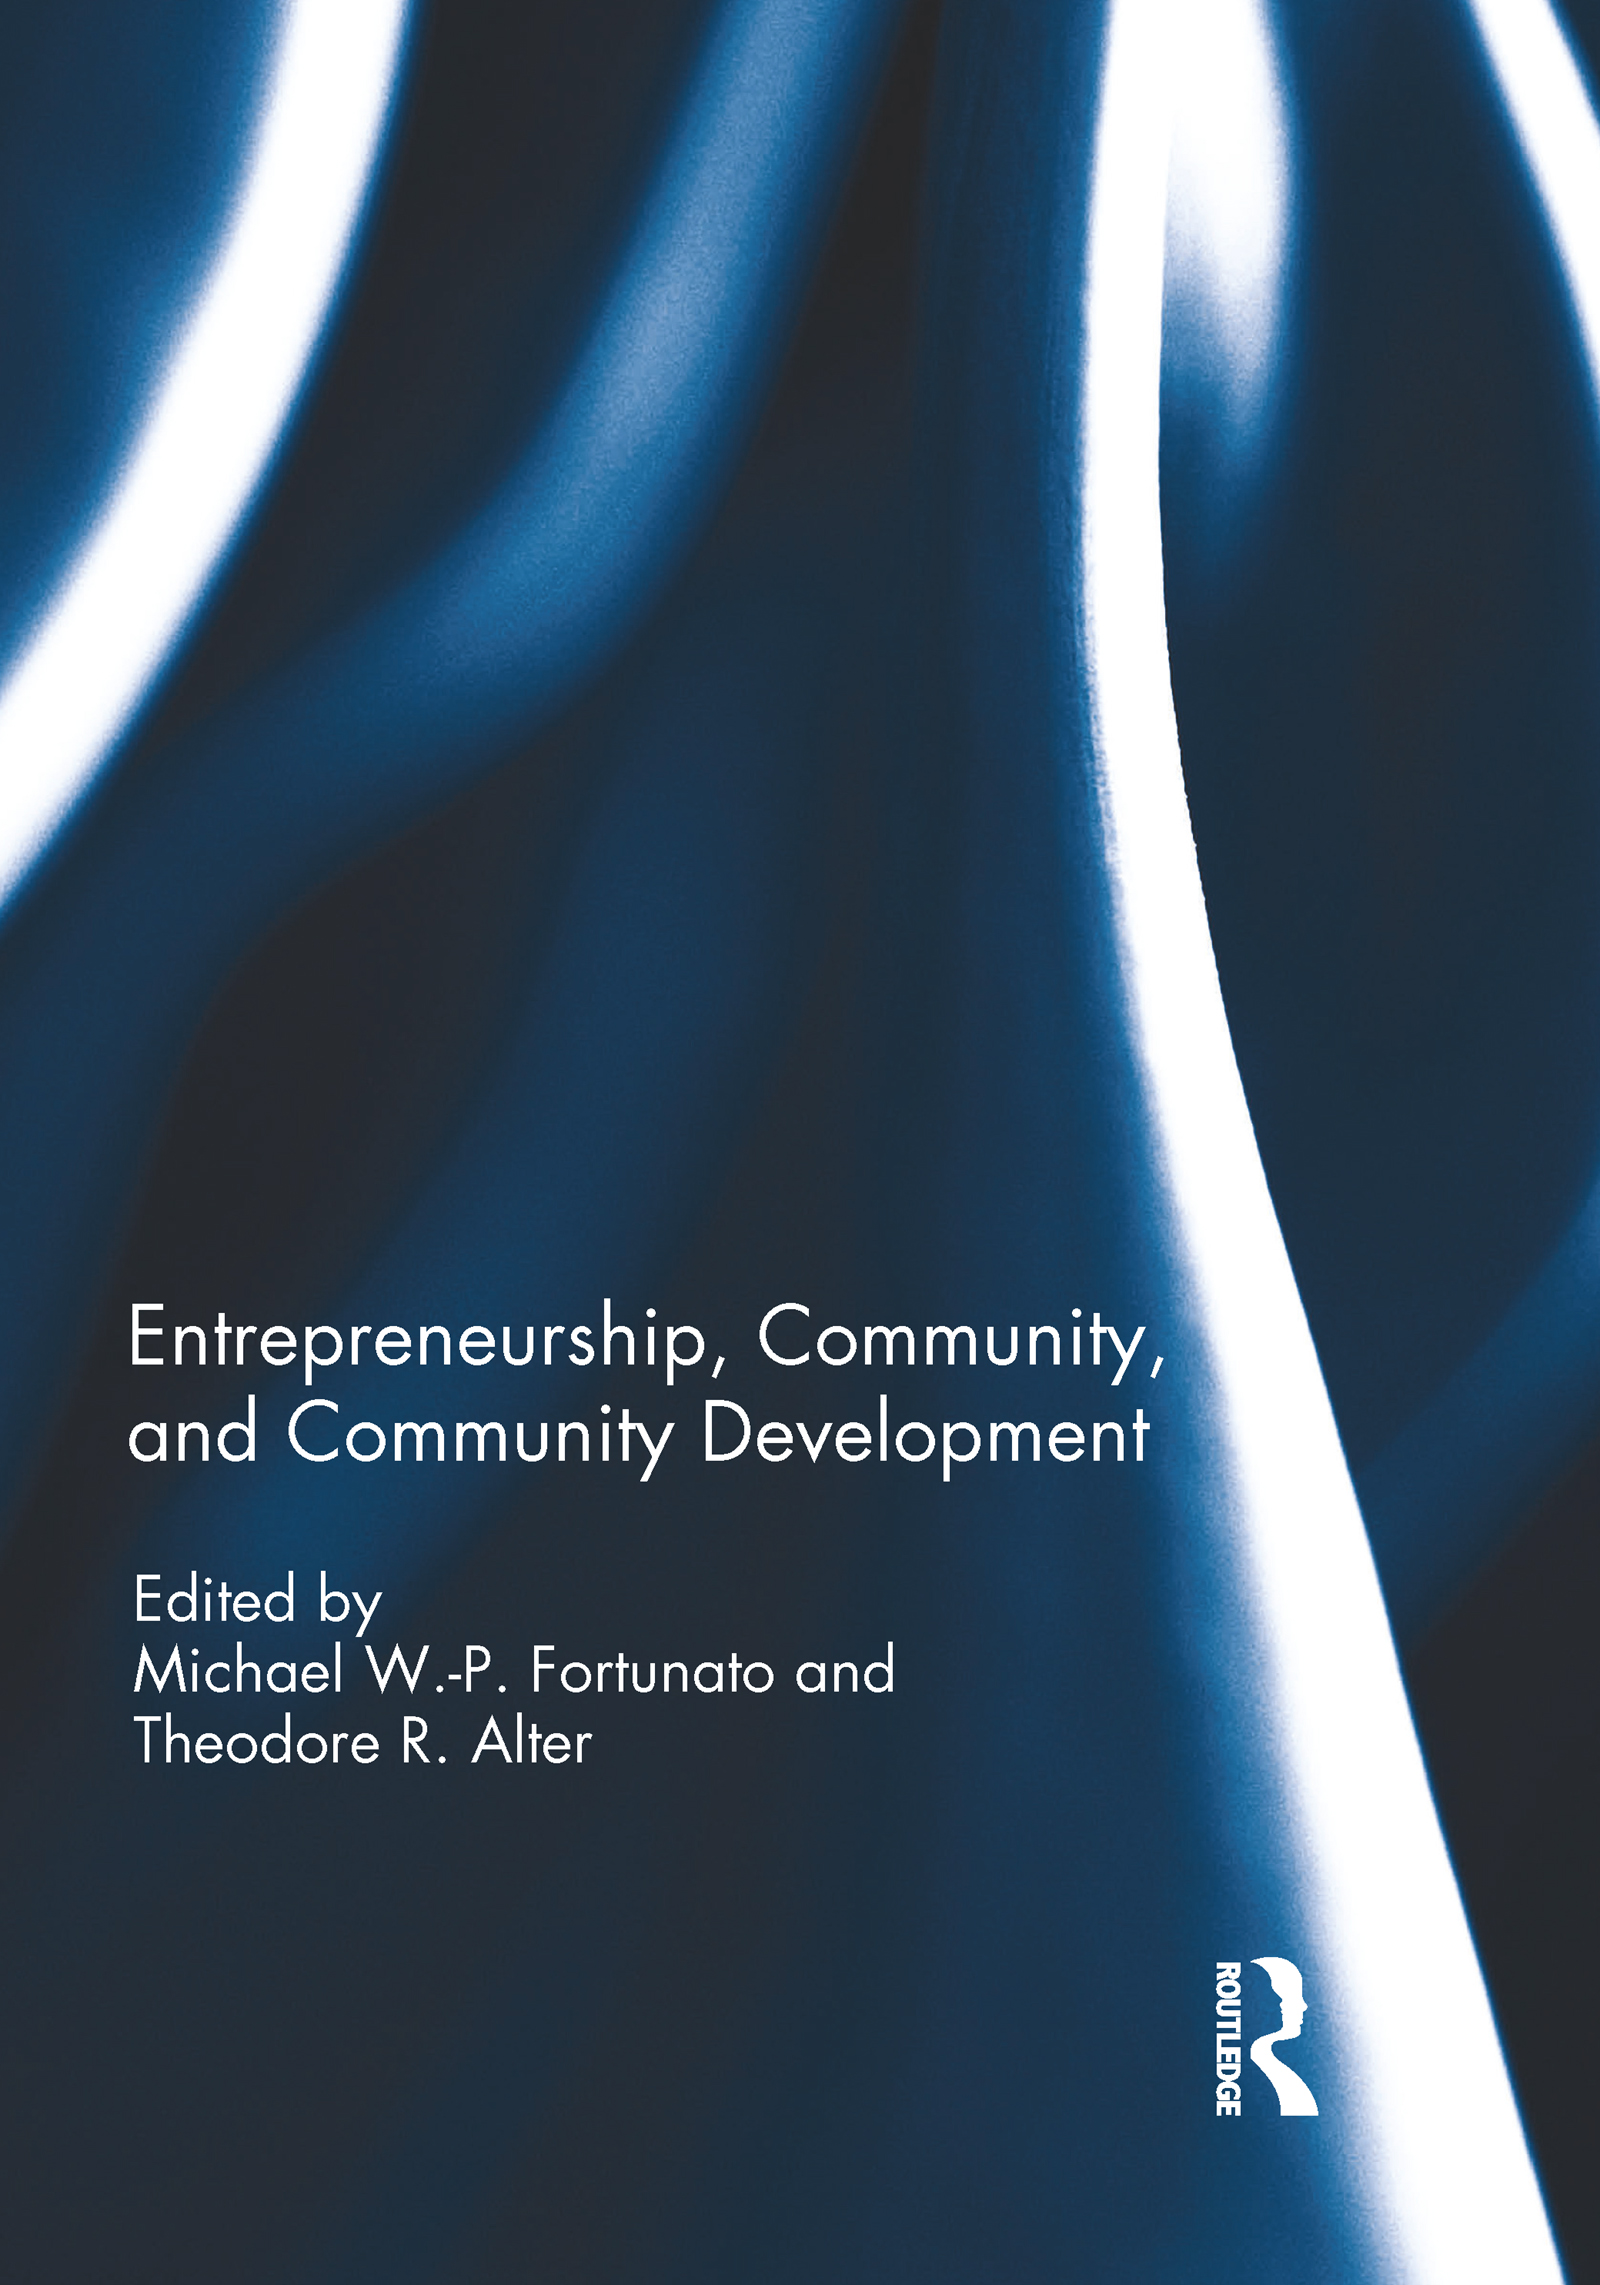 Entrepreneurship, Community, and Community Development